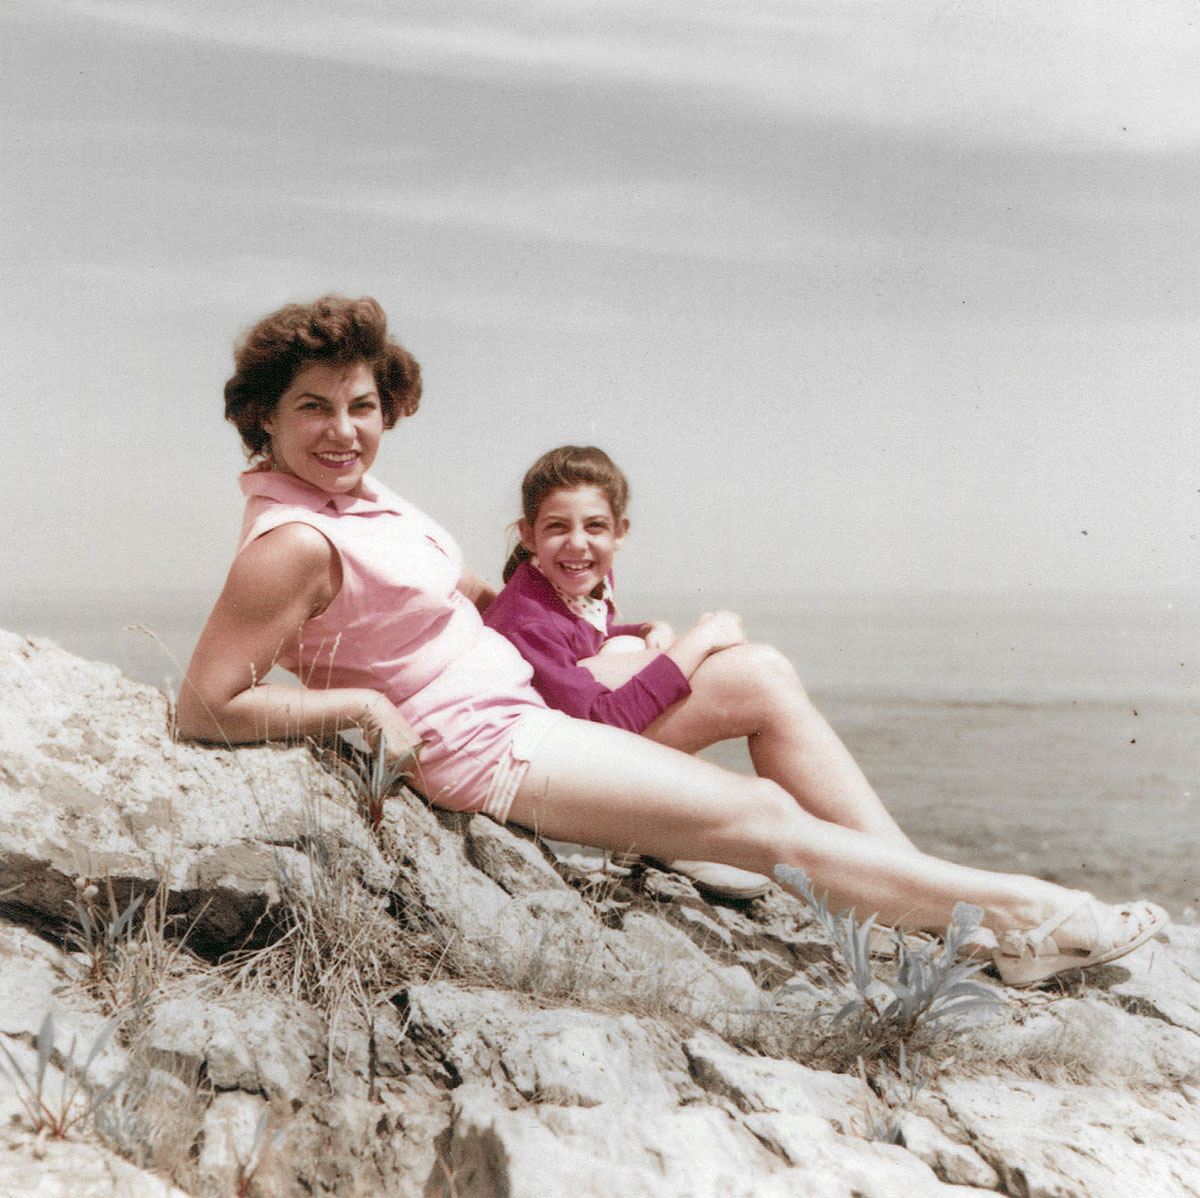 Anita and Ernie, circa 1956